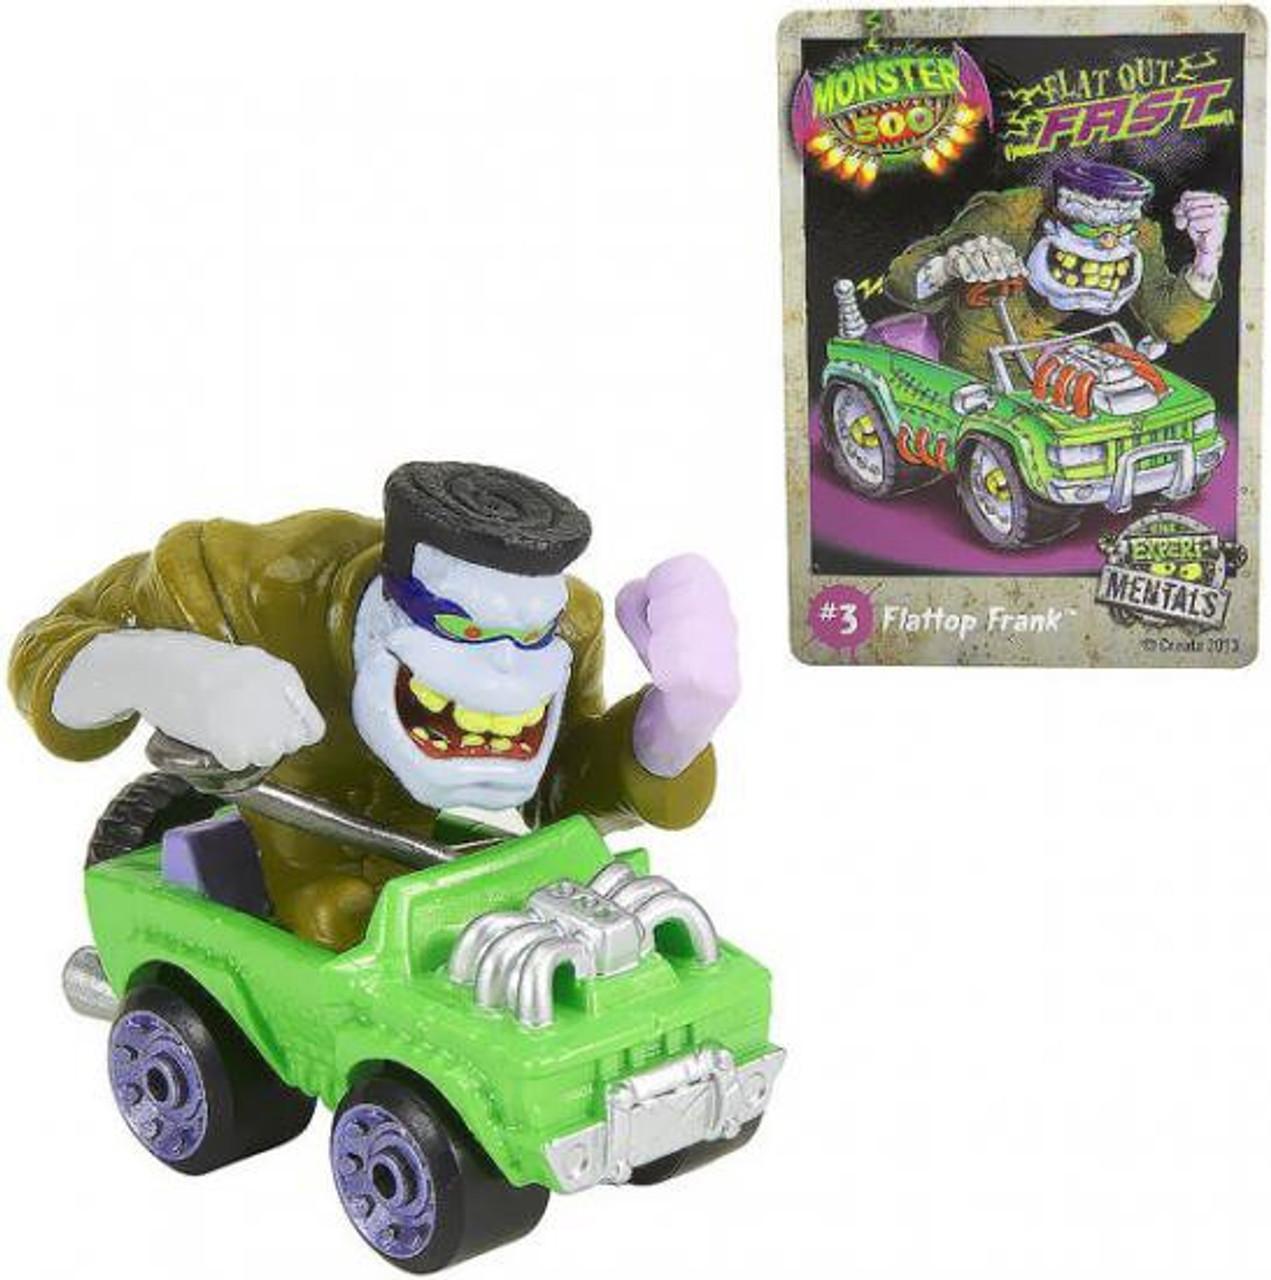 Monster 500 Small Car Flattop Frank Vehicle Figure